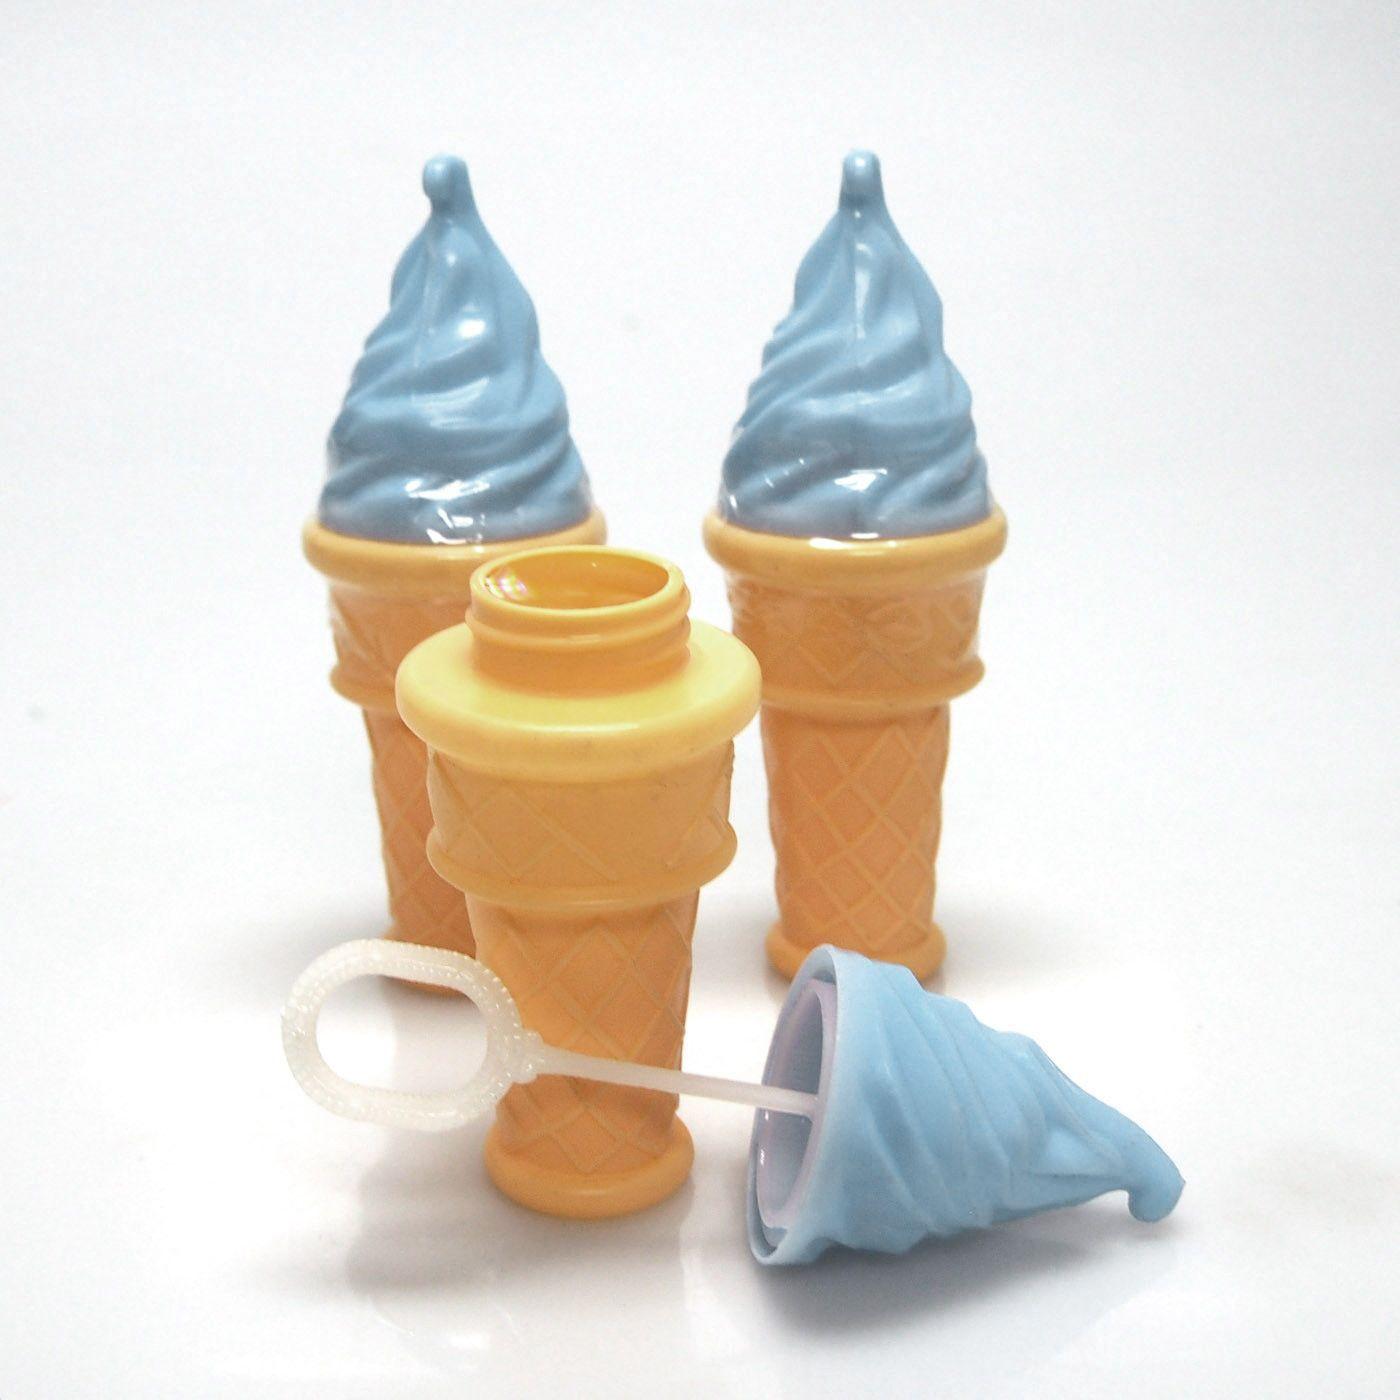 ice cream cone bubbles bottle 5 inch 3 piece blue in 2019 candy 9th bday decoracion de. Black Bedroom Furniture Sets. Home Design Ideas